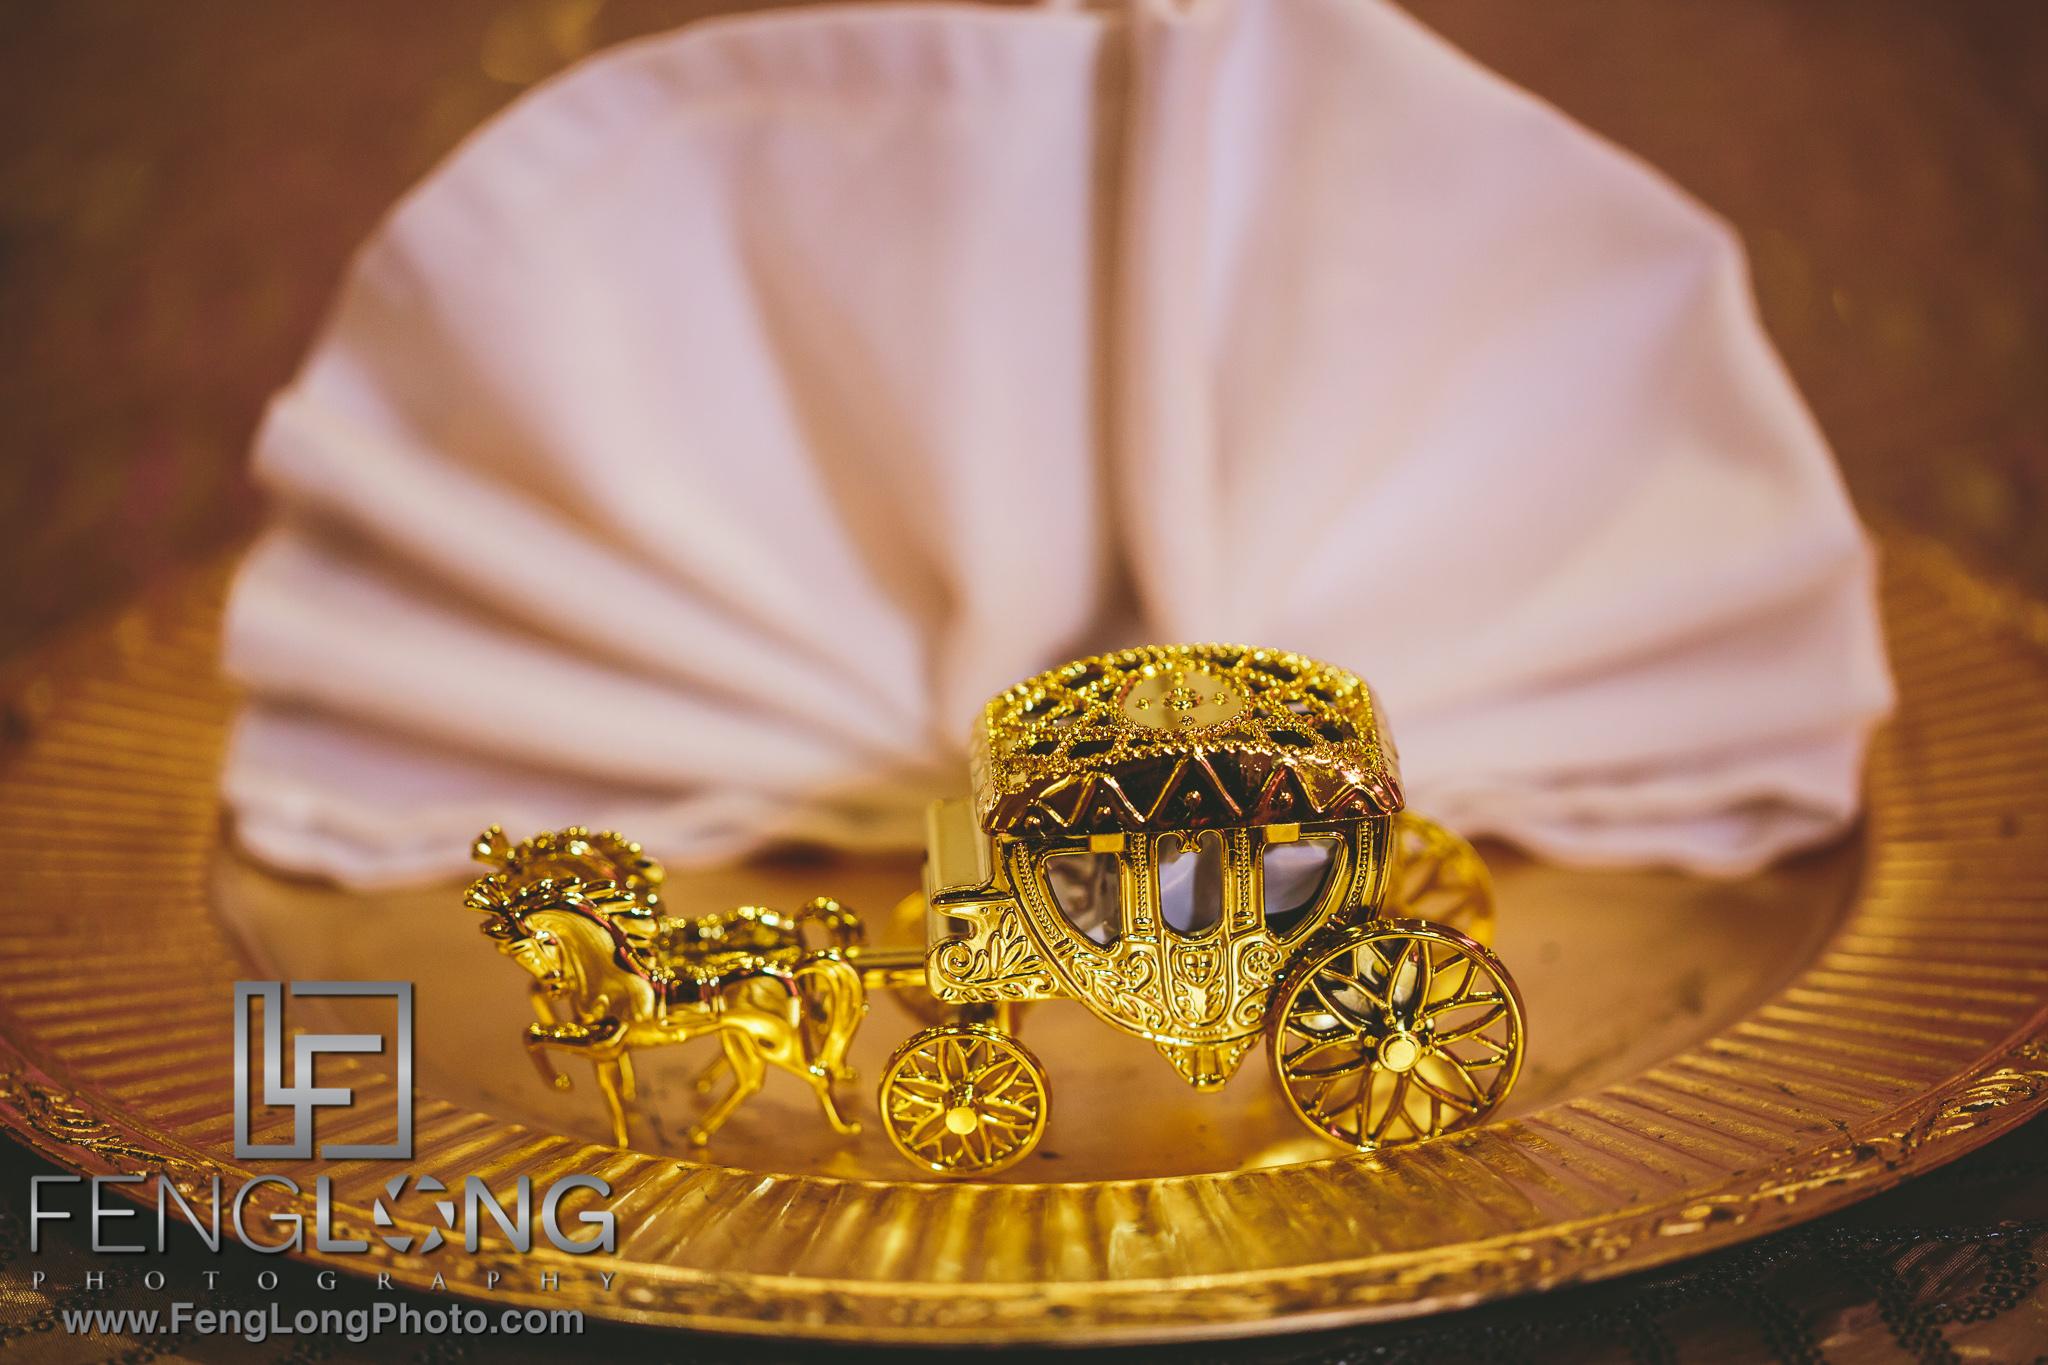 atlanta-indian-wedding-nikkah-reception-crowne-plaza-323955